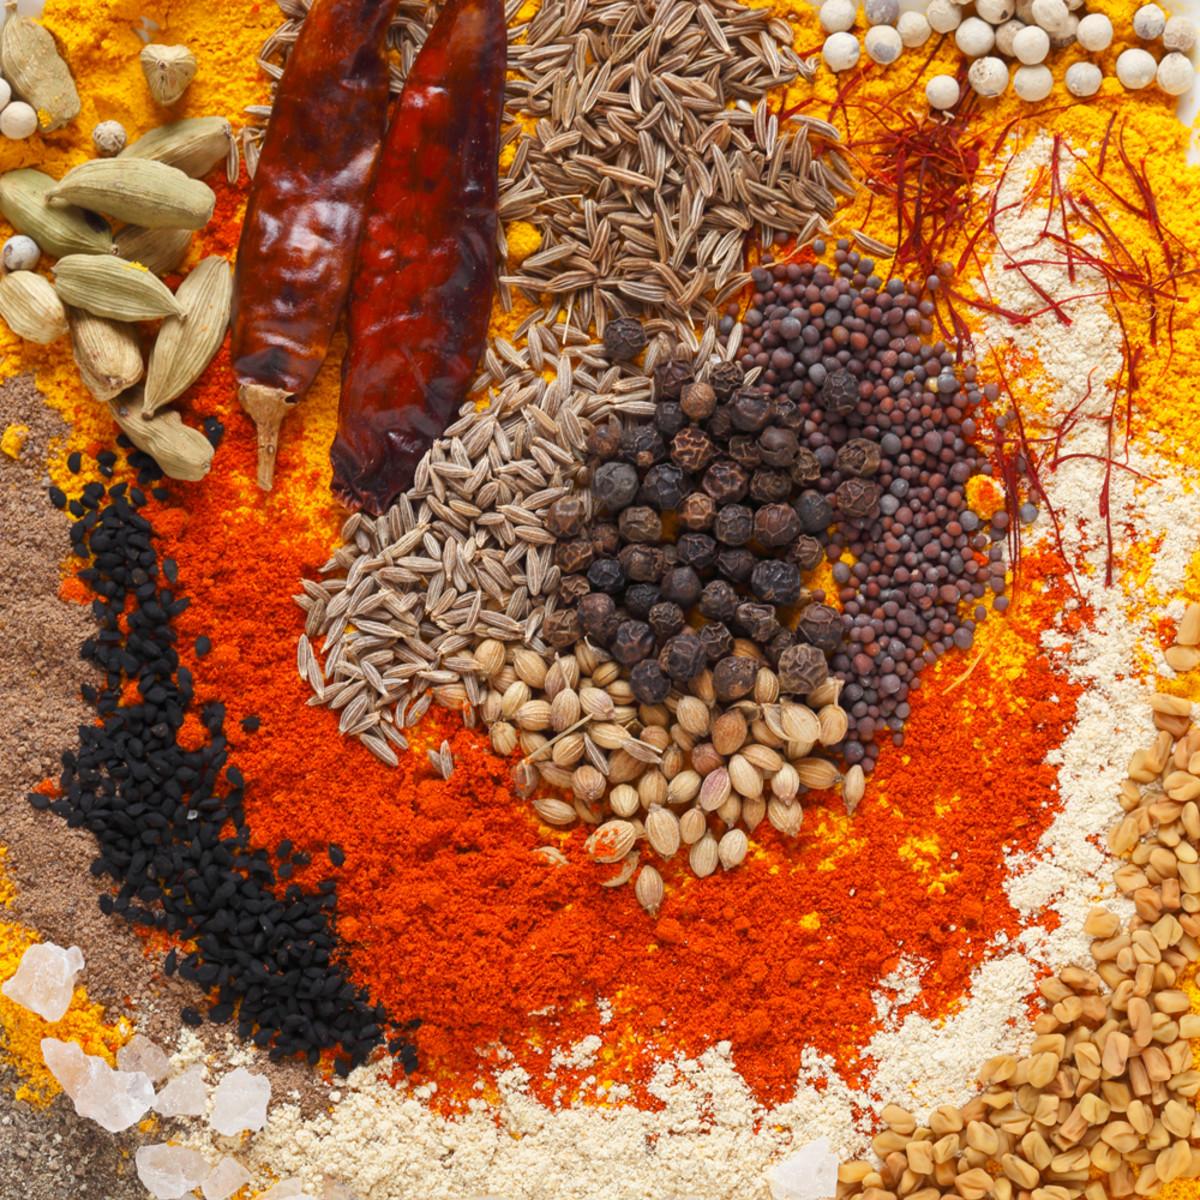 Curry spices: Black pepper, coriander seeds, black mustard seeds, cumin seeds; dried chillies, chilli powder, caraway seeds, saffron strands, white peppercorns, turmeric powder, fenugreek powder and seeds. Image:  © Paul_Cowan - Depositphotos.com